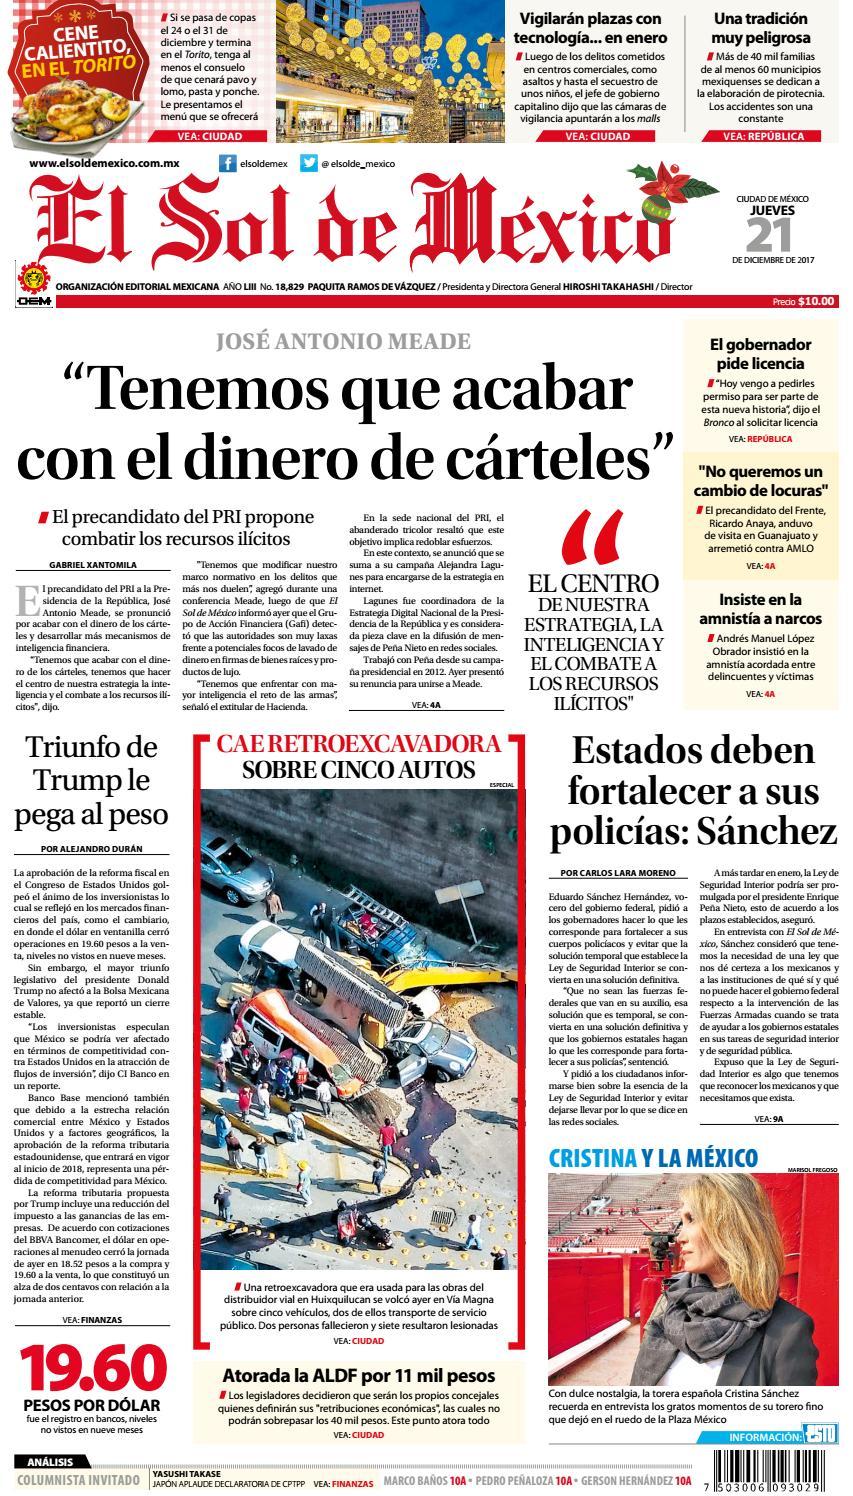 El Sol de México 21 de Diciembre de 2017 by El Sol de México - issuu fdeb82862edb8